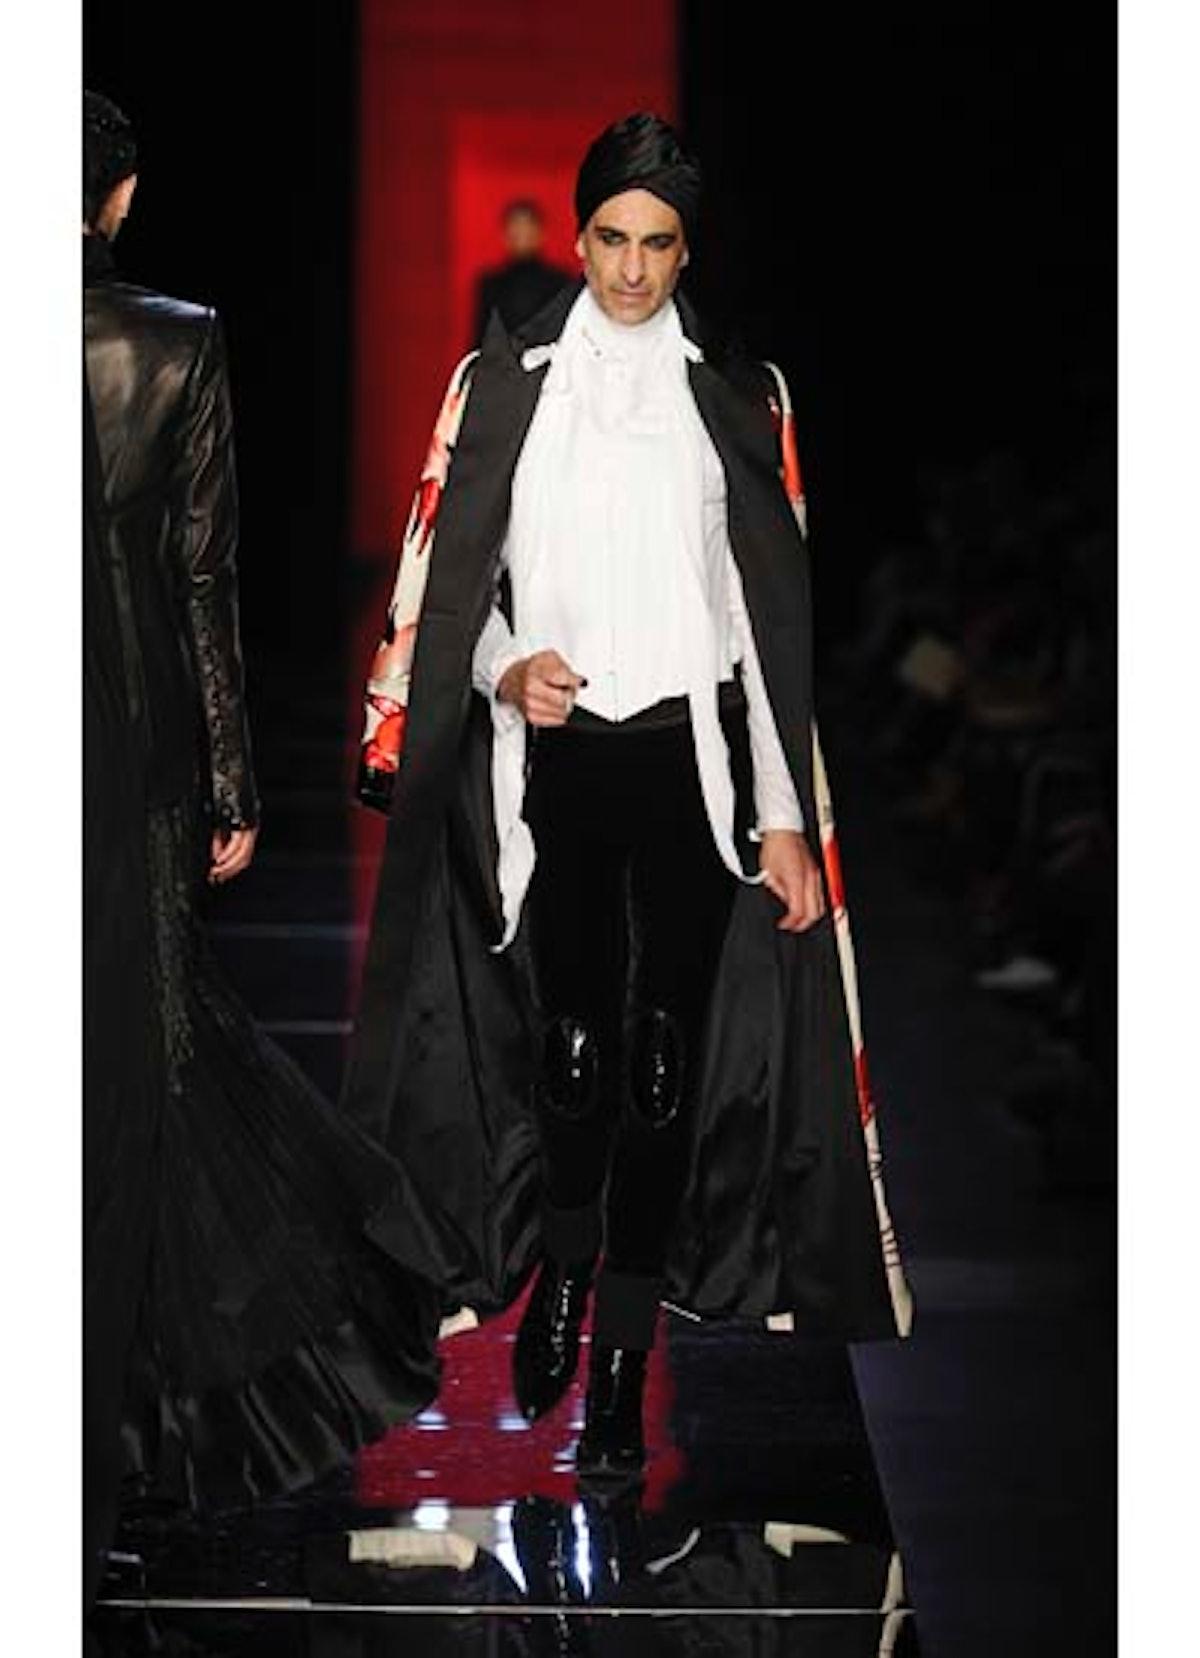 fass-jean-paul-gaultier-couture-2012-runway-35-v.jpg